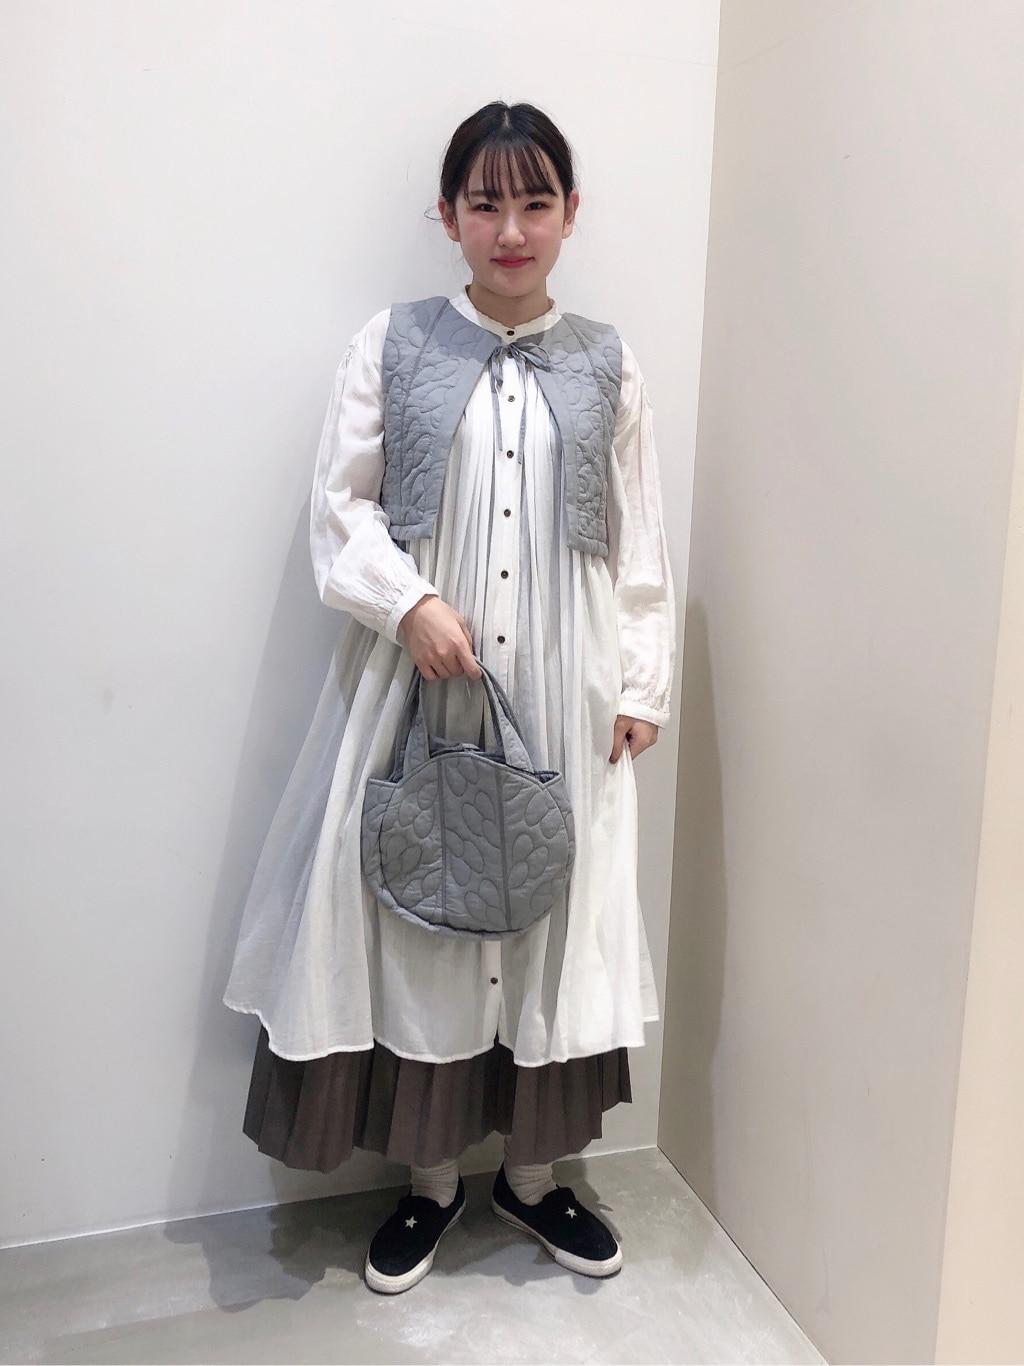 bulle de savon 阪急西宮ガーデンズ 身長:166cm 2020.12.01